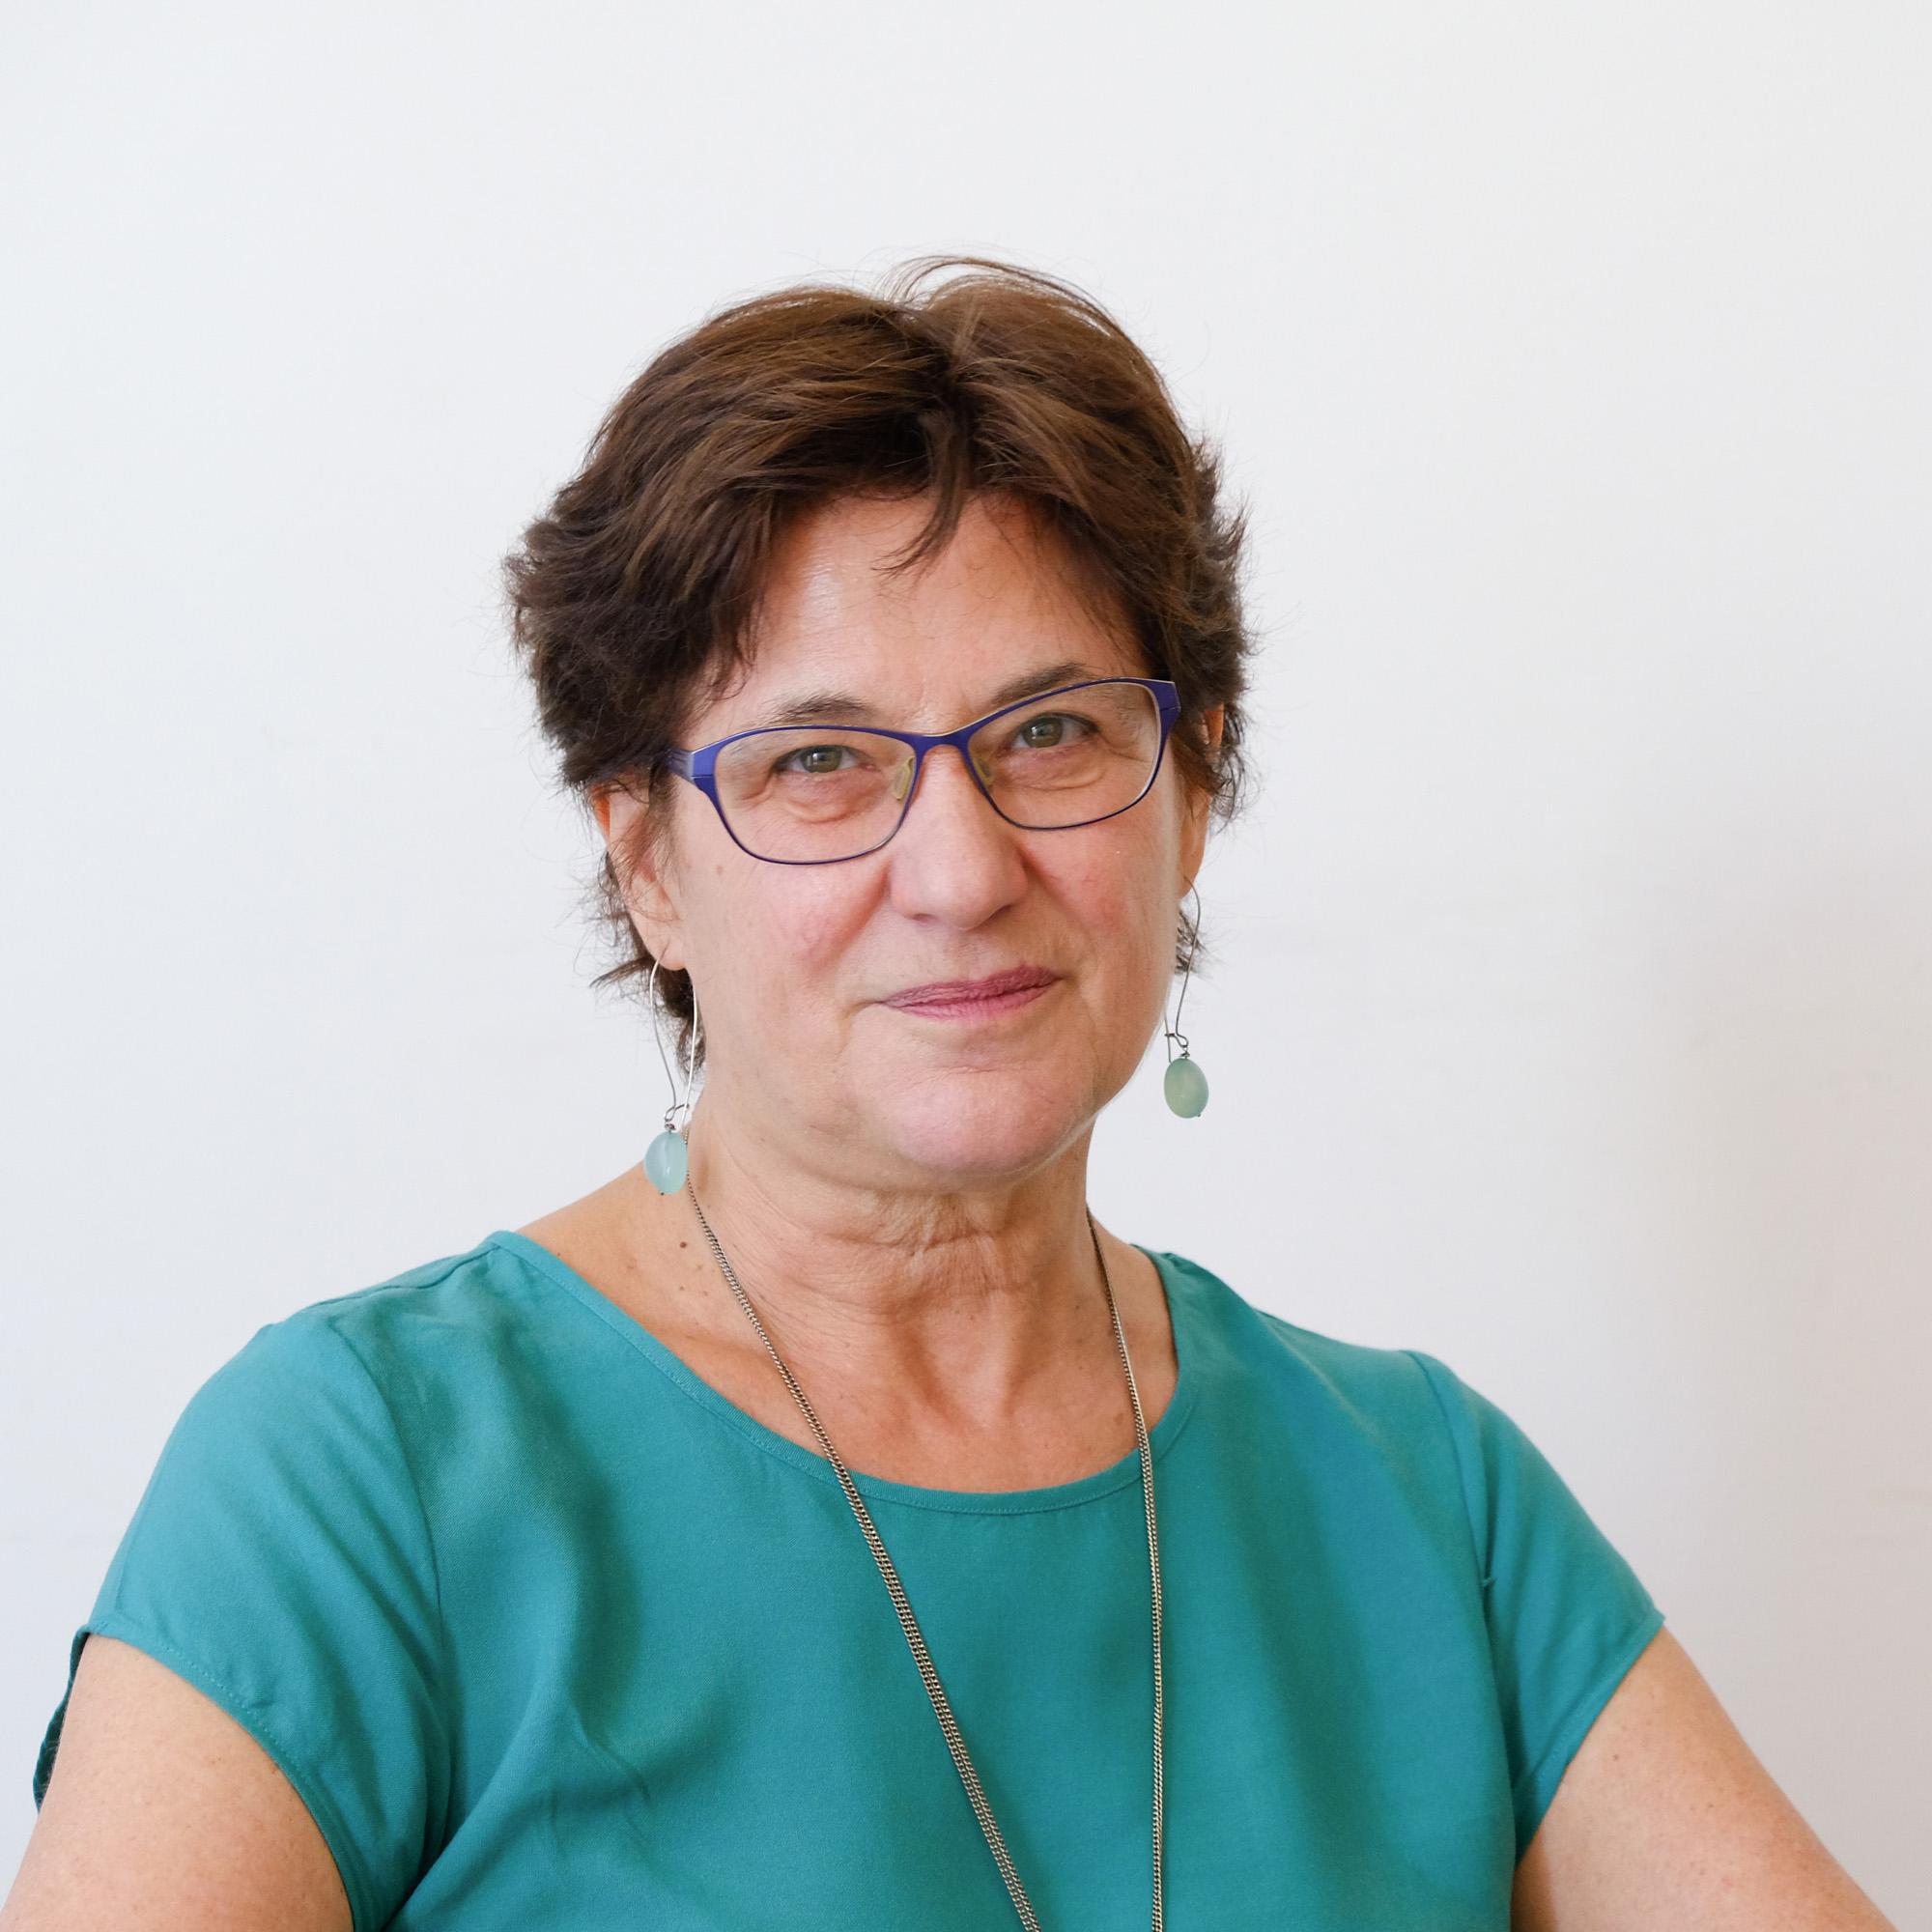 Anna Maria Paternuosto